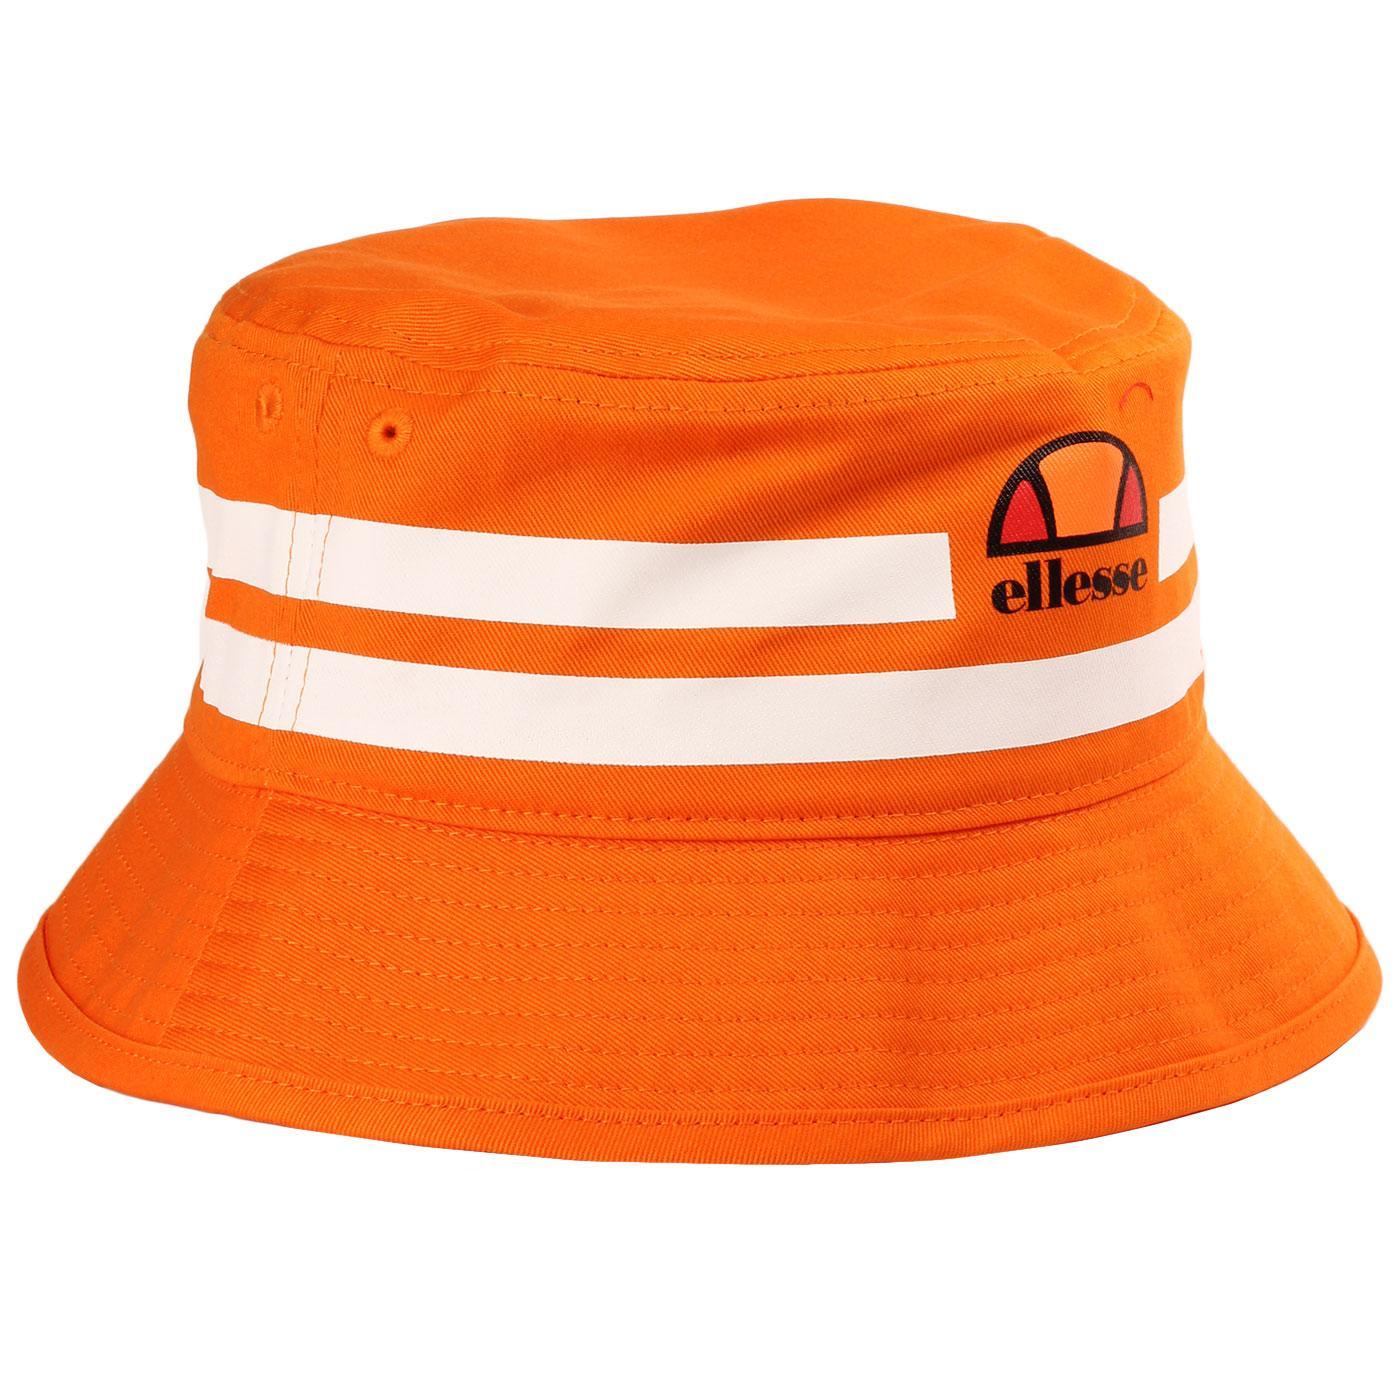 Lanori ELLESSE Retro 90s Bucket Hat (Netherlands)